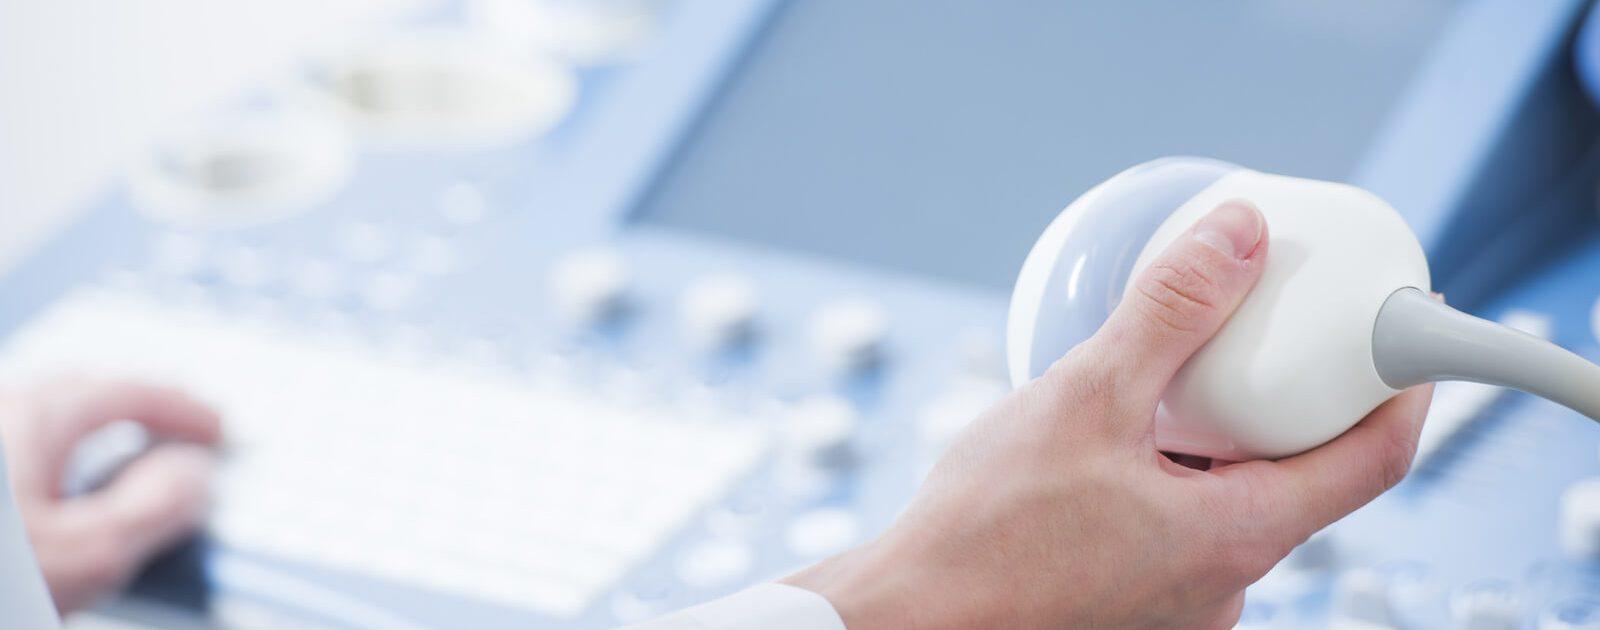 Ab der sechsten Schwangerschaftswoche kann ein Ultraschall beim Frauenarzt erfolgen.